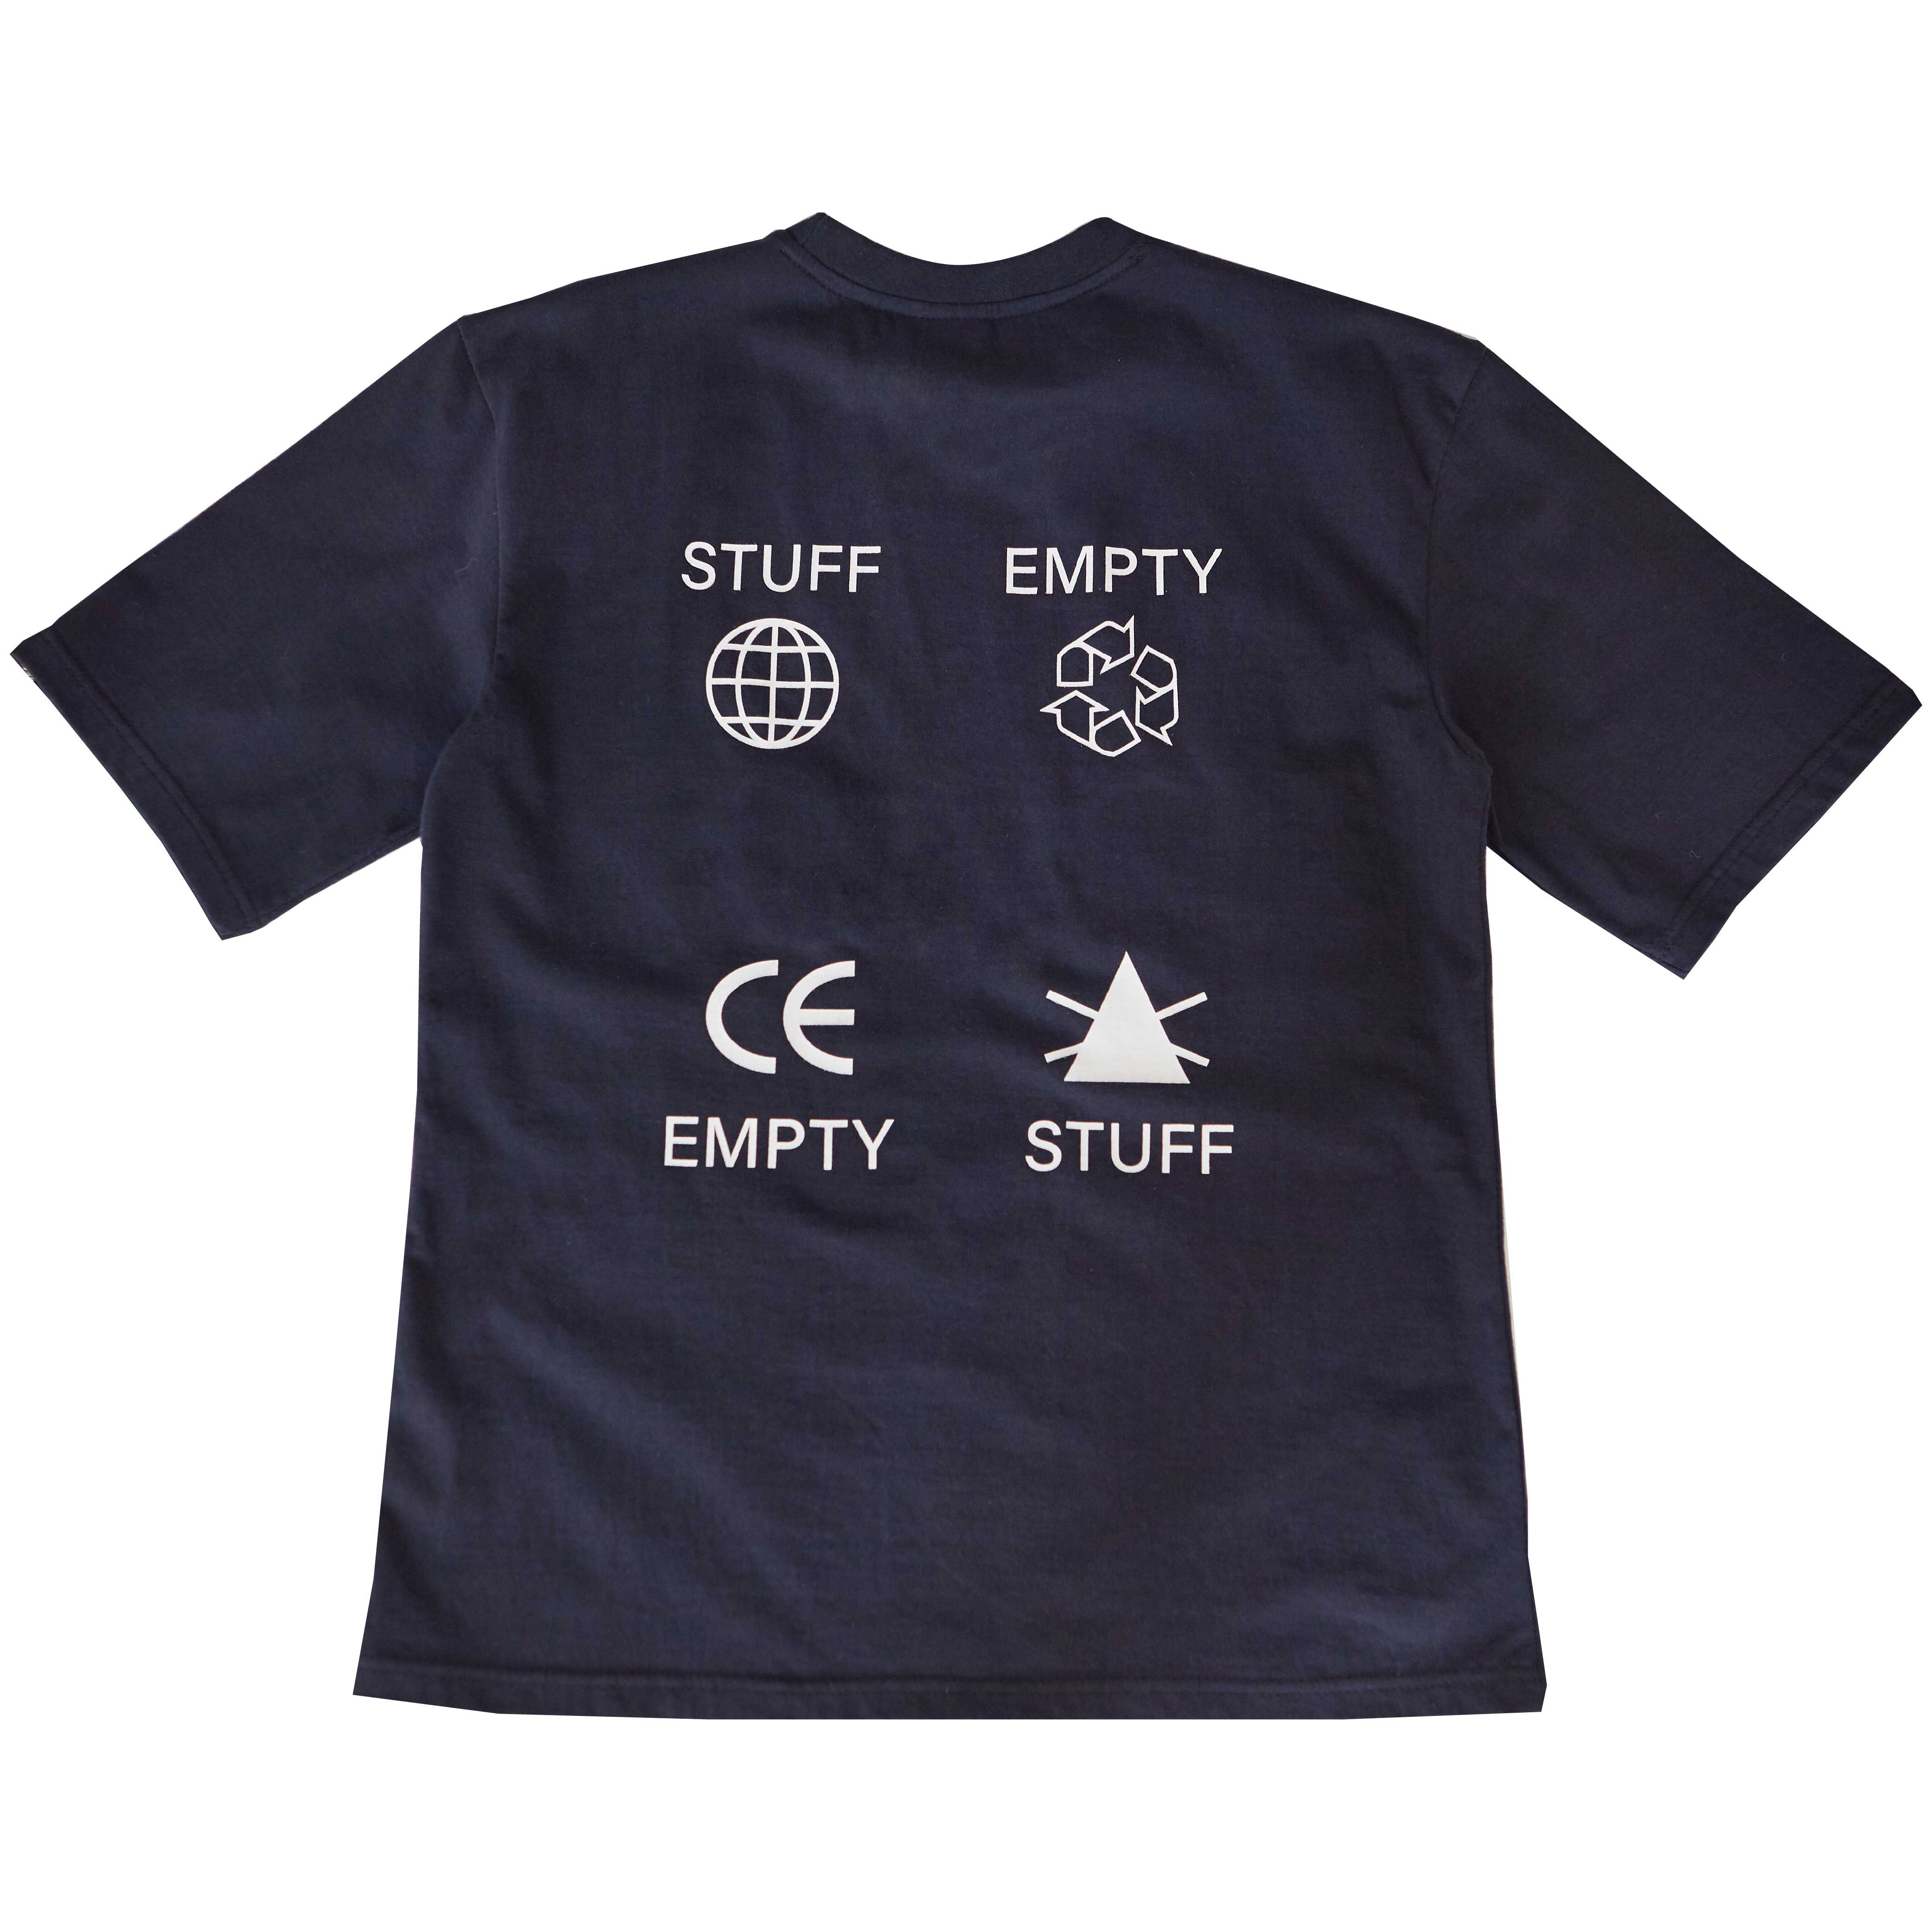 Stuff & Empty (Navy)